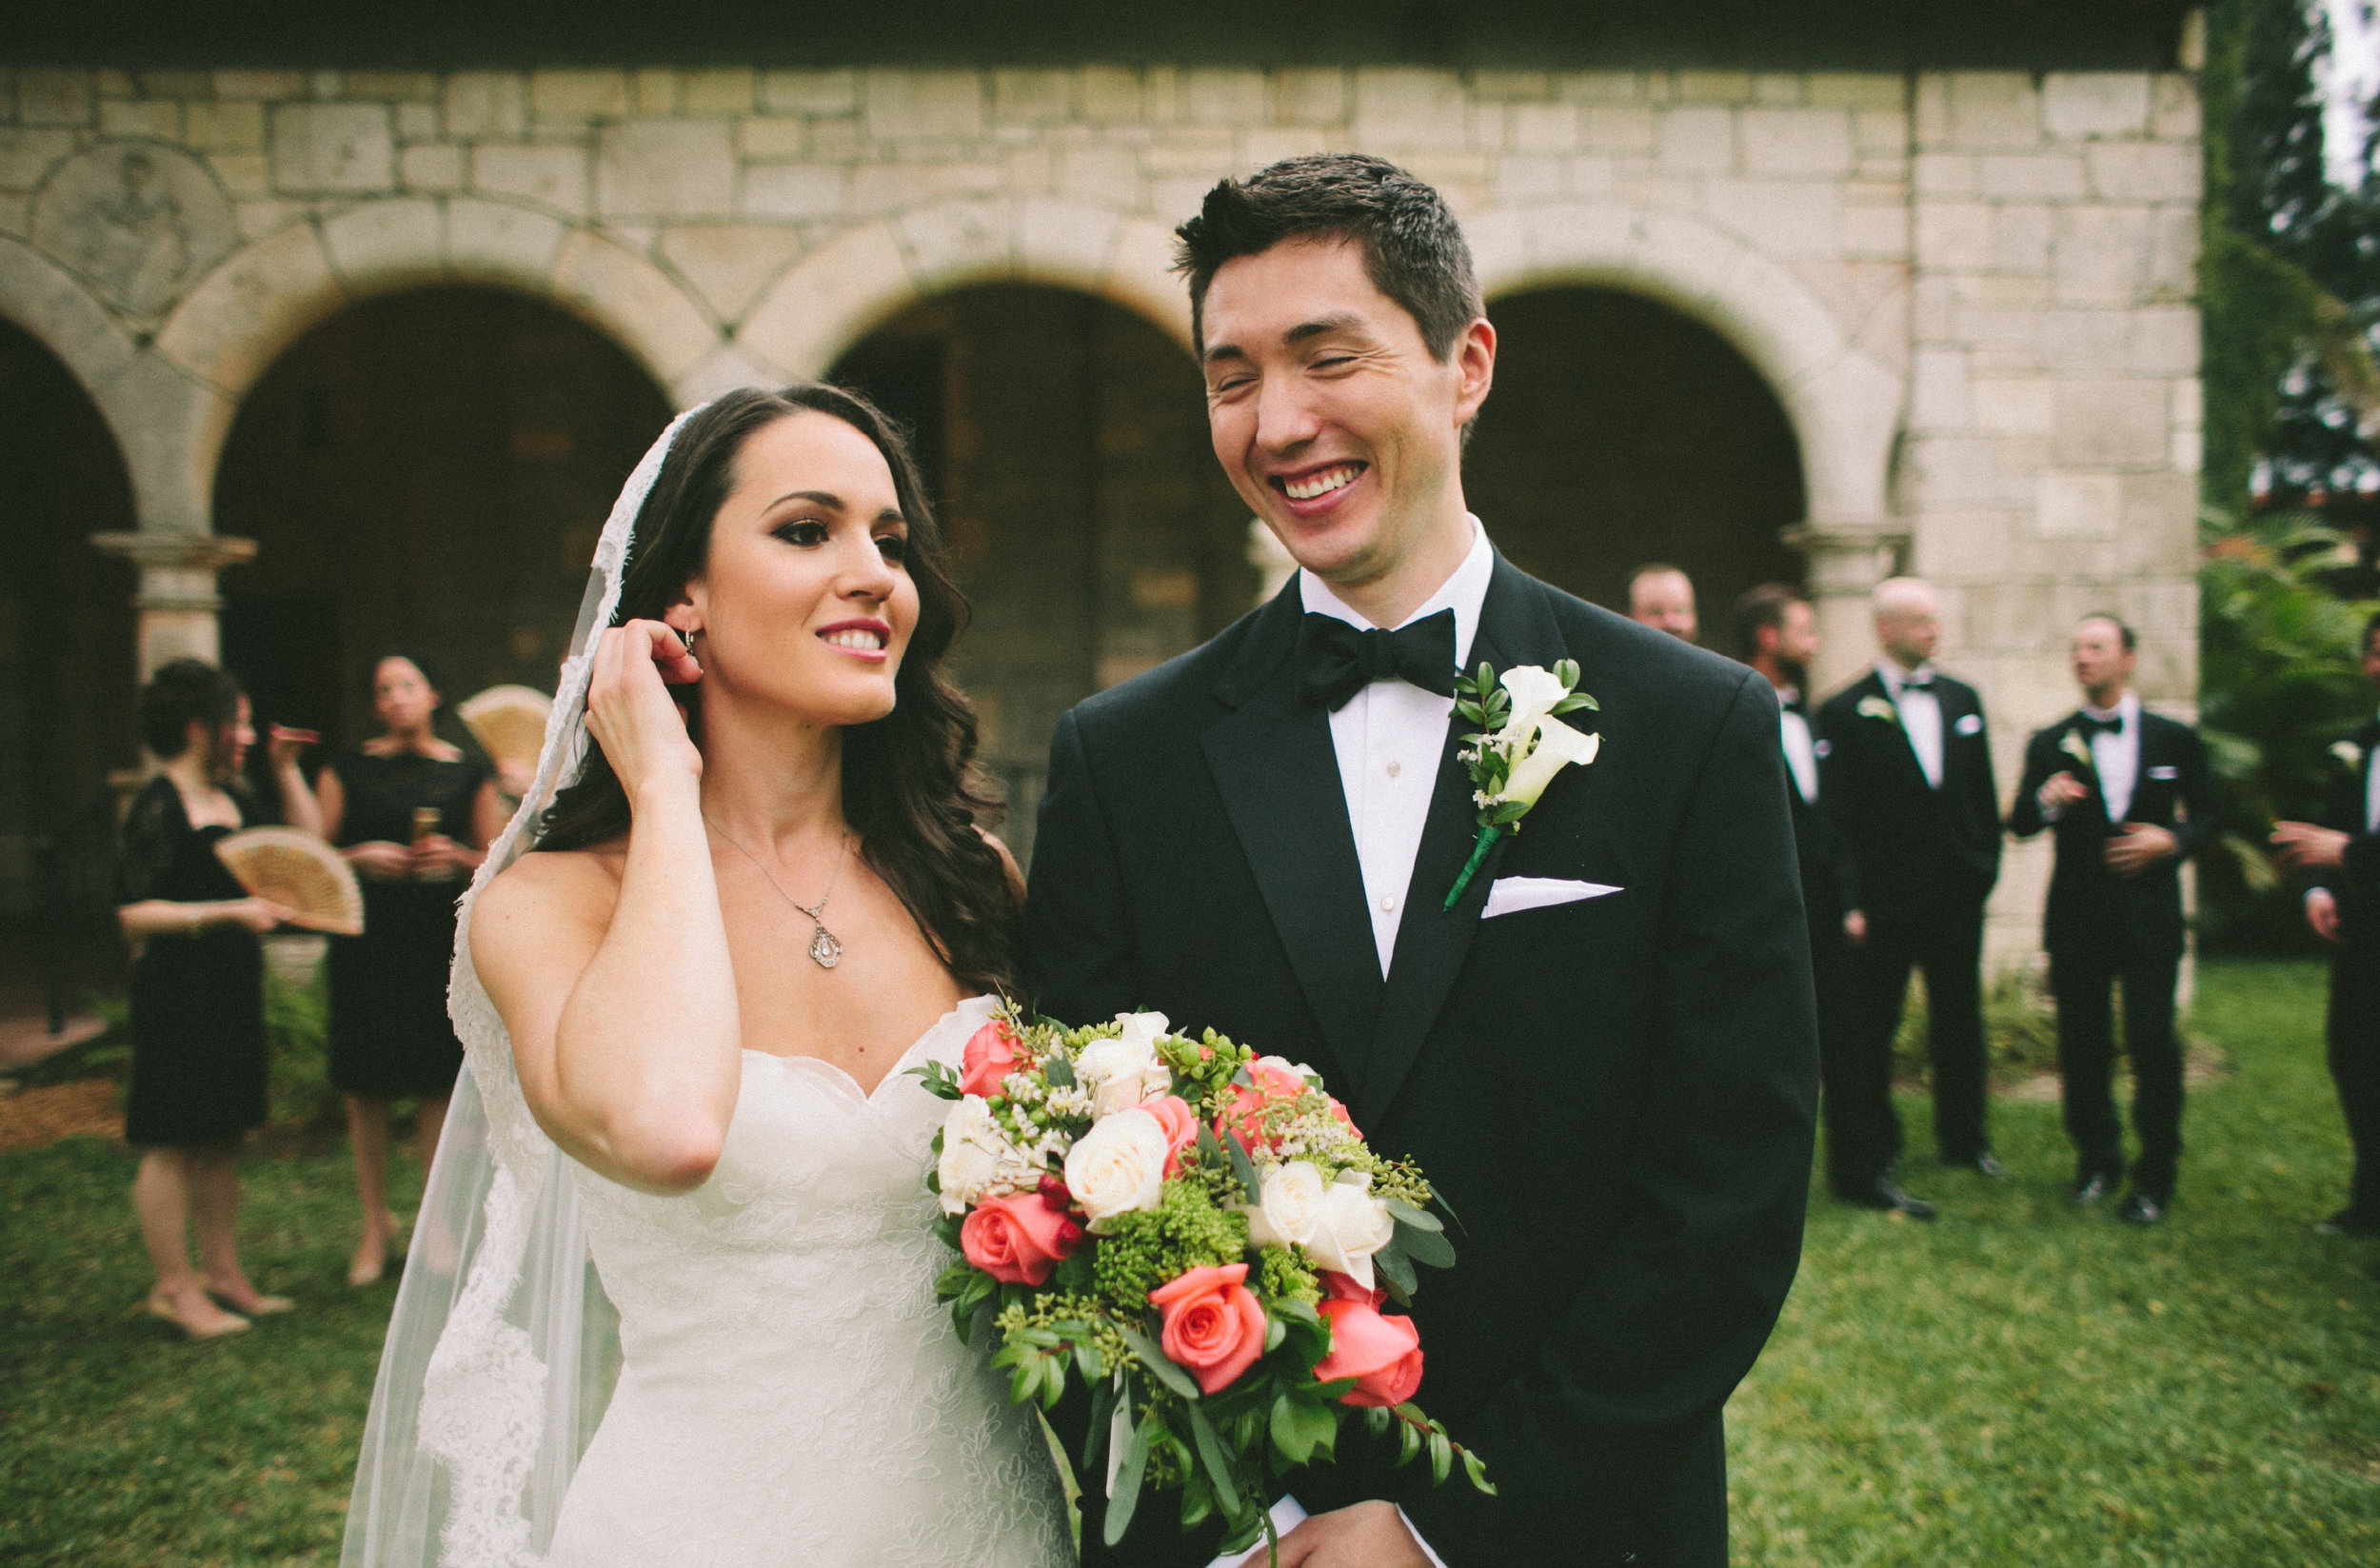 Wedding at the Spanish Monastery Miami Beach64.jpg